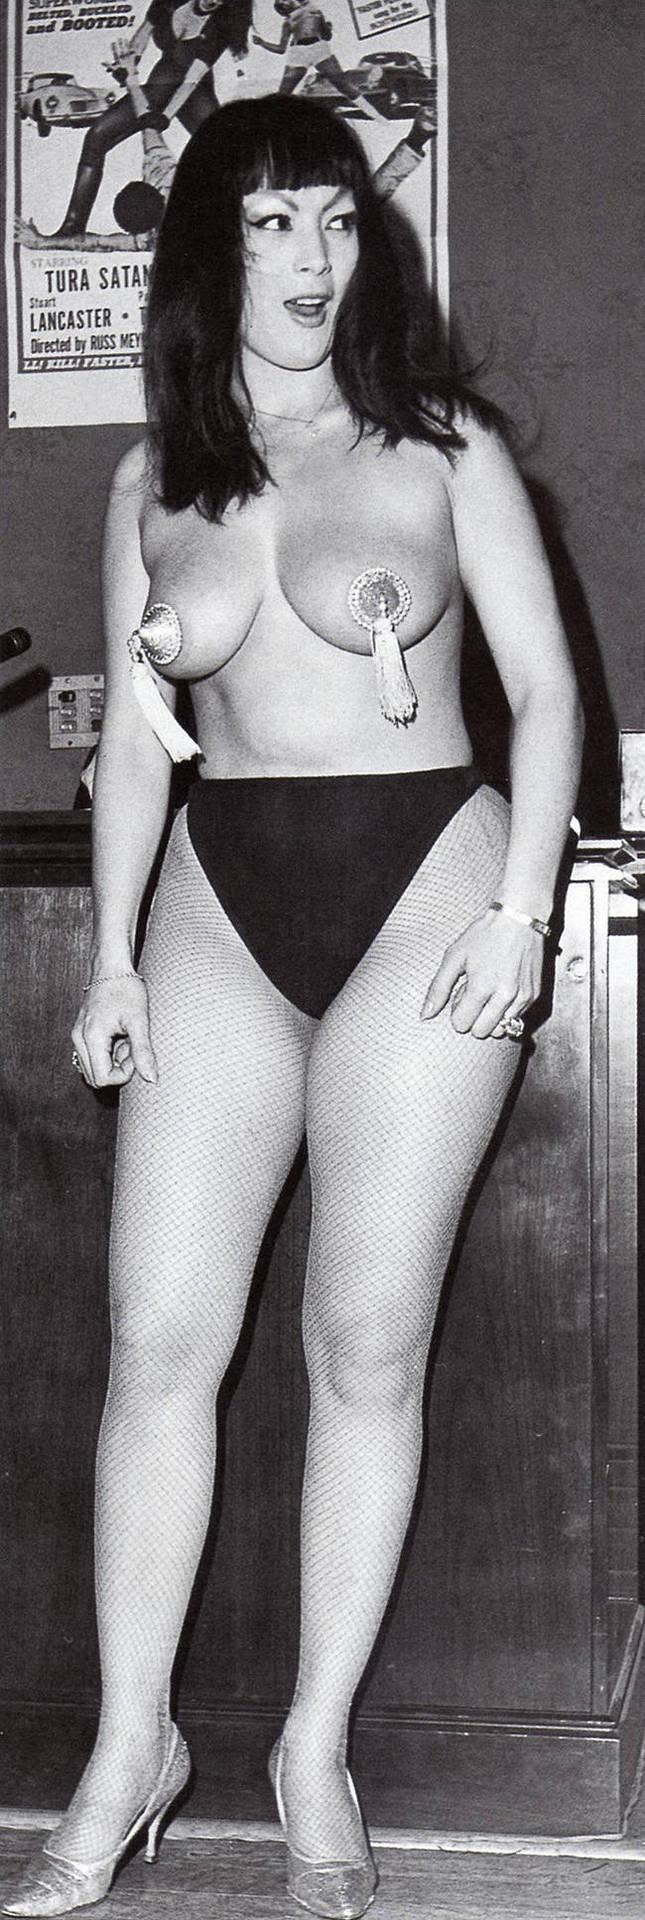 Tura Satana nudes (29 photo), Pussy, Paparazzi, Twitter, cleavage 2020